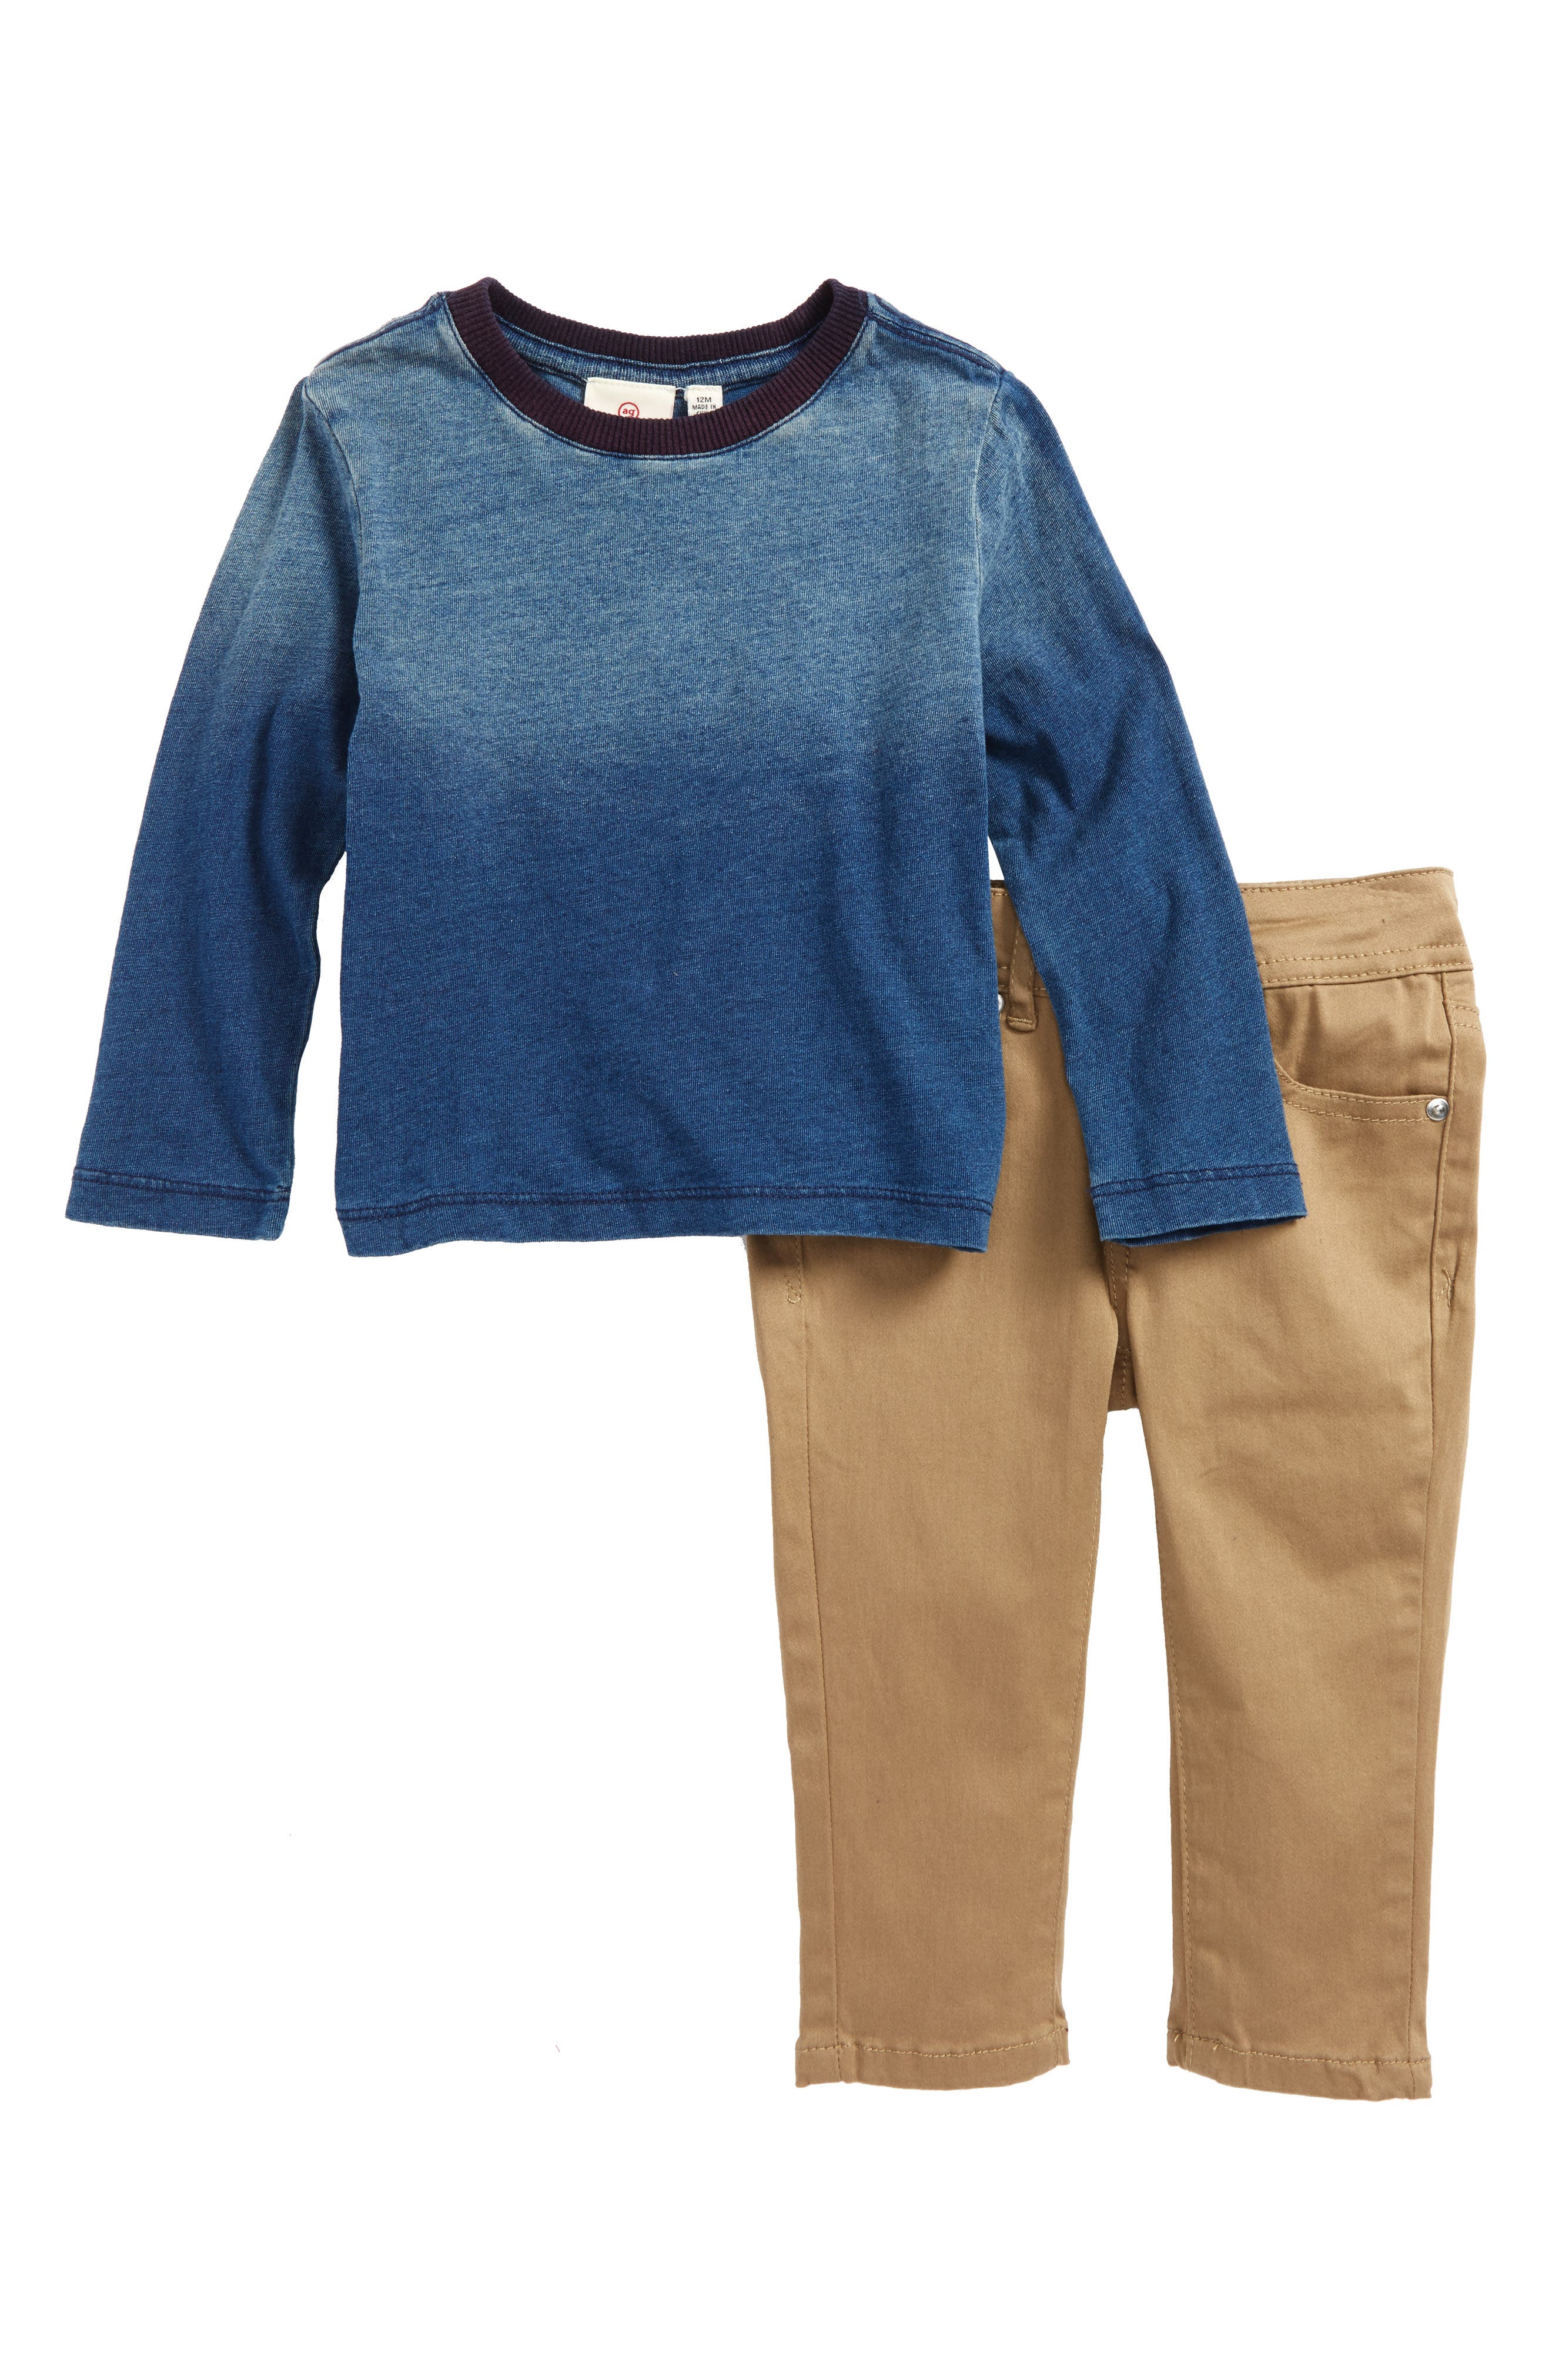 ag adriano goldschmied kids T-Shirt & Pants Set (Baby Boys)